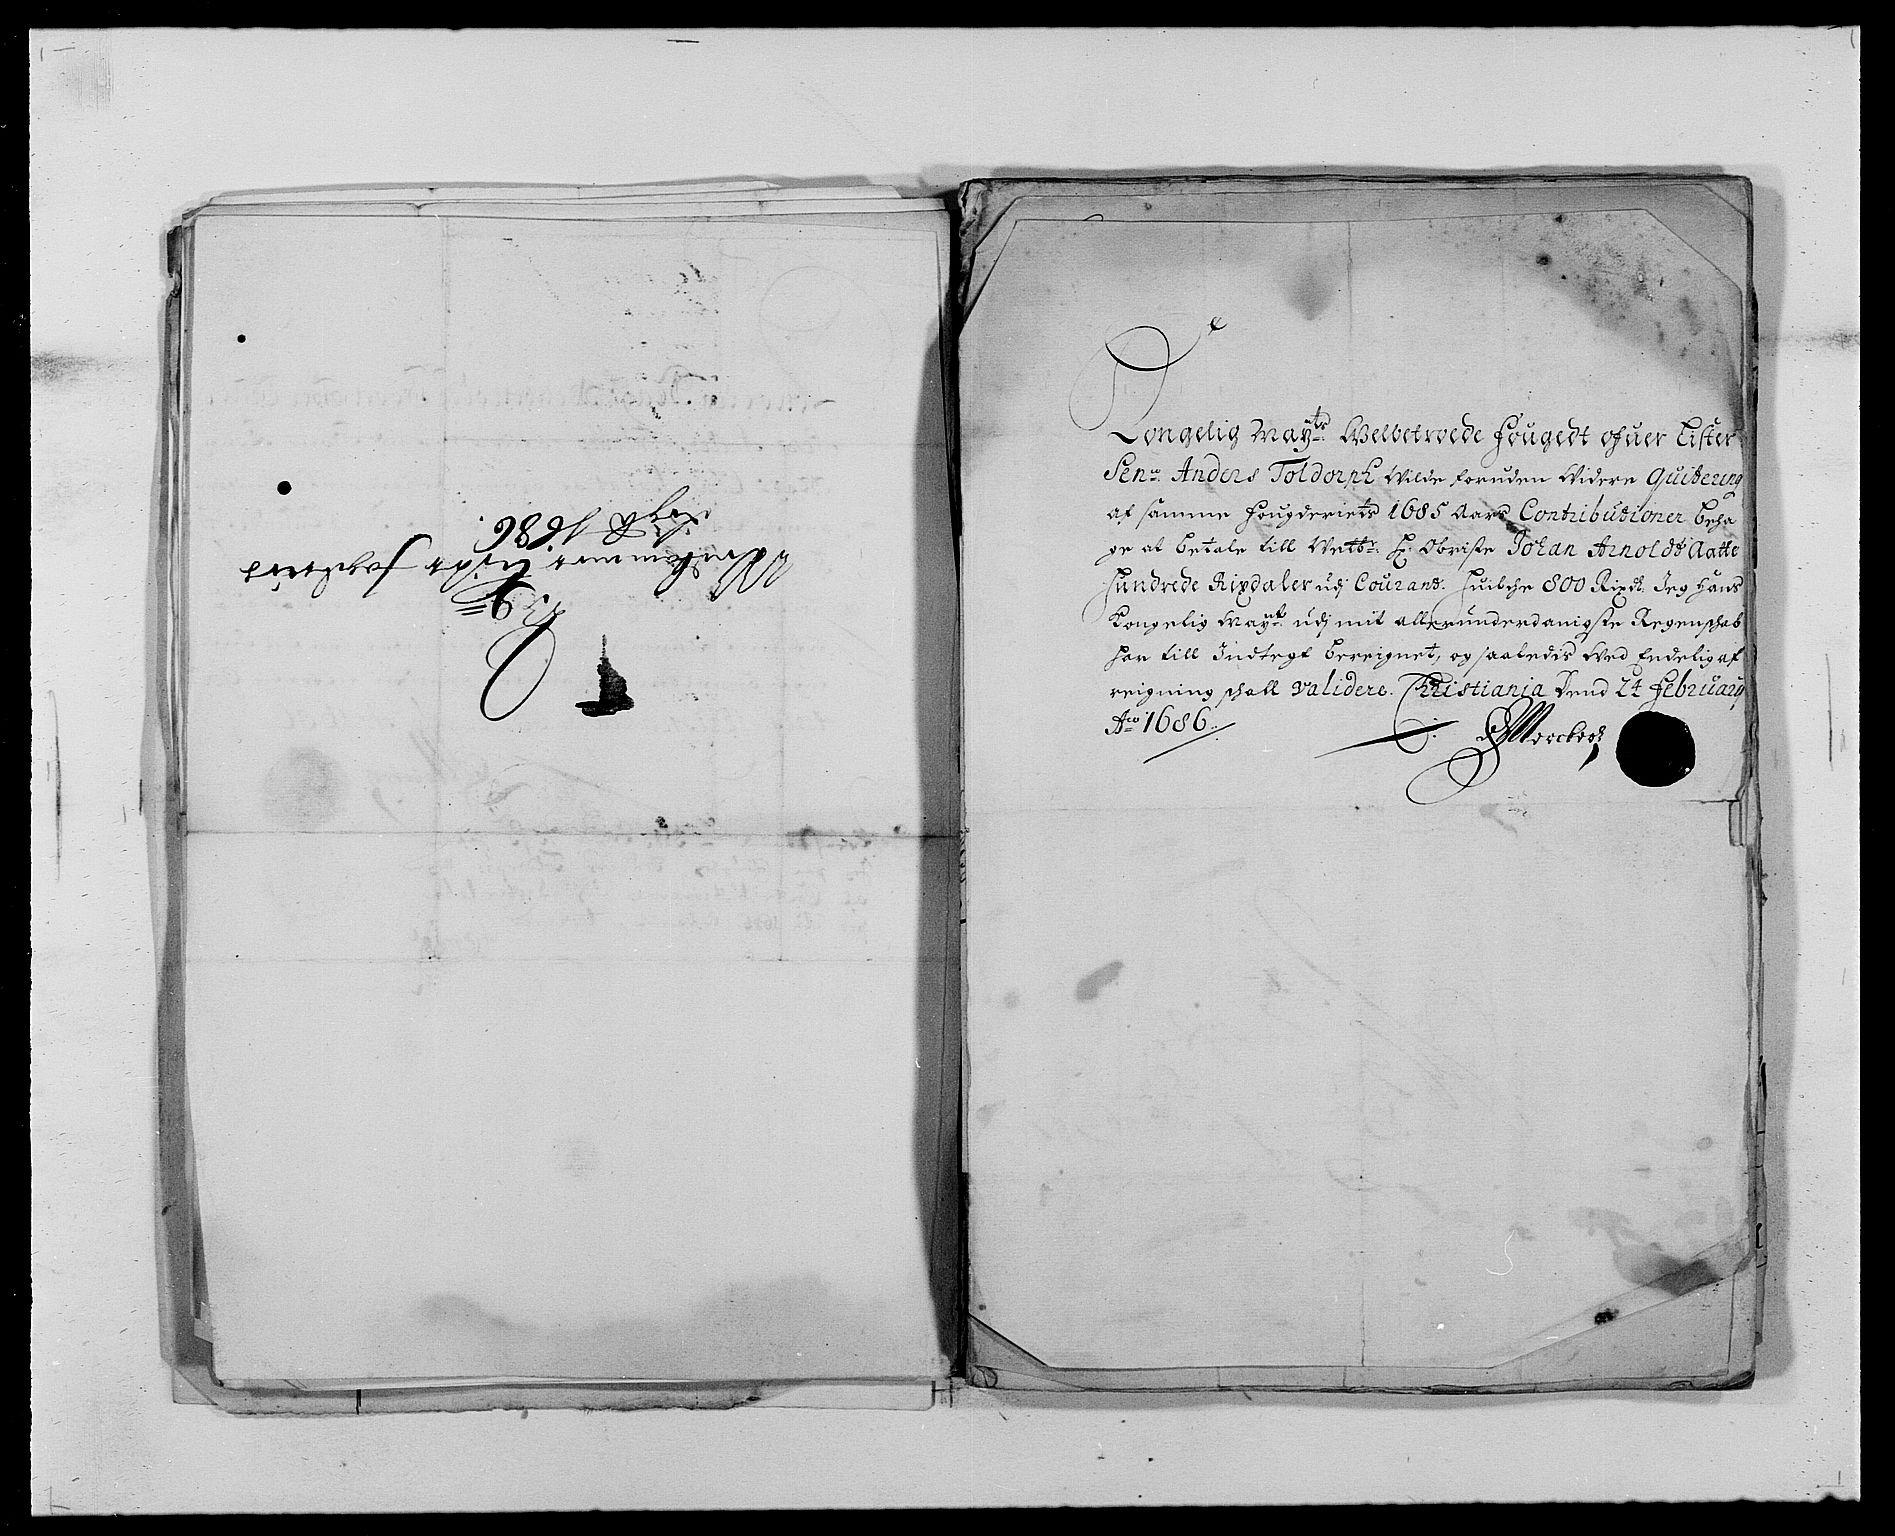 RA, Rentekammeret inntil 1814, Reviderte regnskaper, Fogderegnskap, R41/L2535: Fogderegnskap Lista, 1686-1689, s. 46